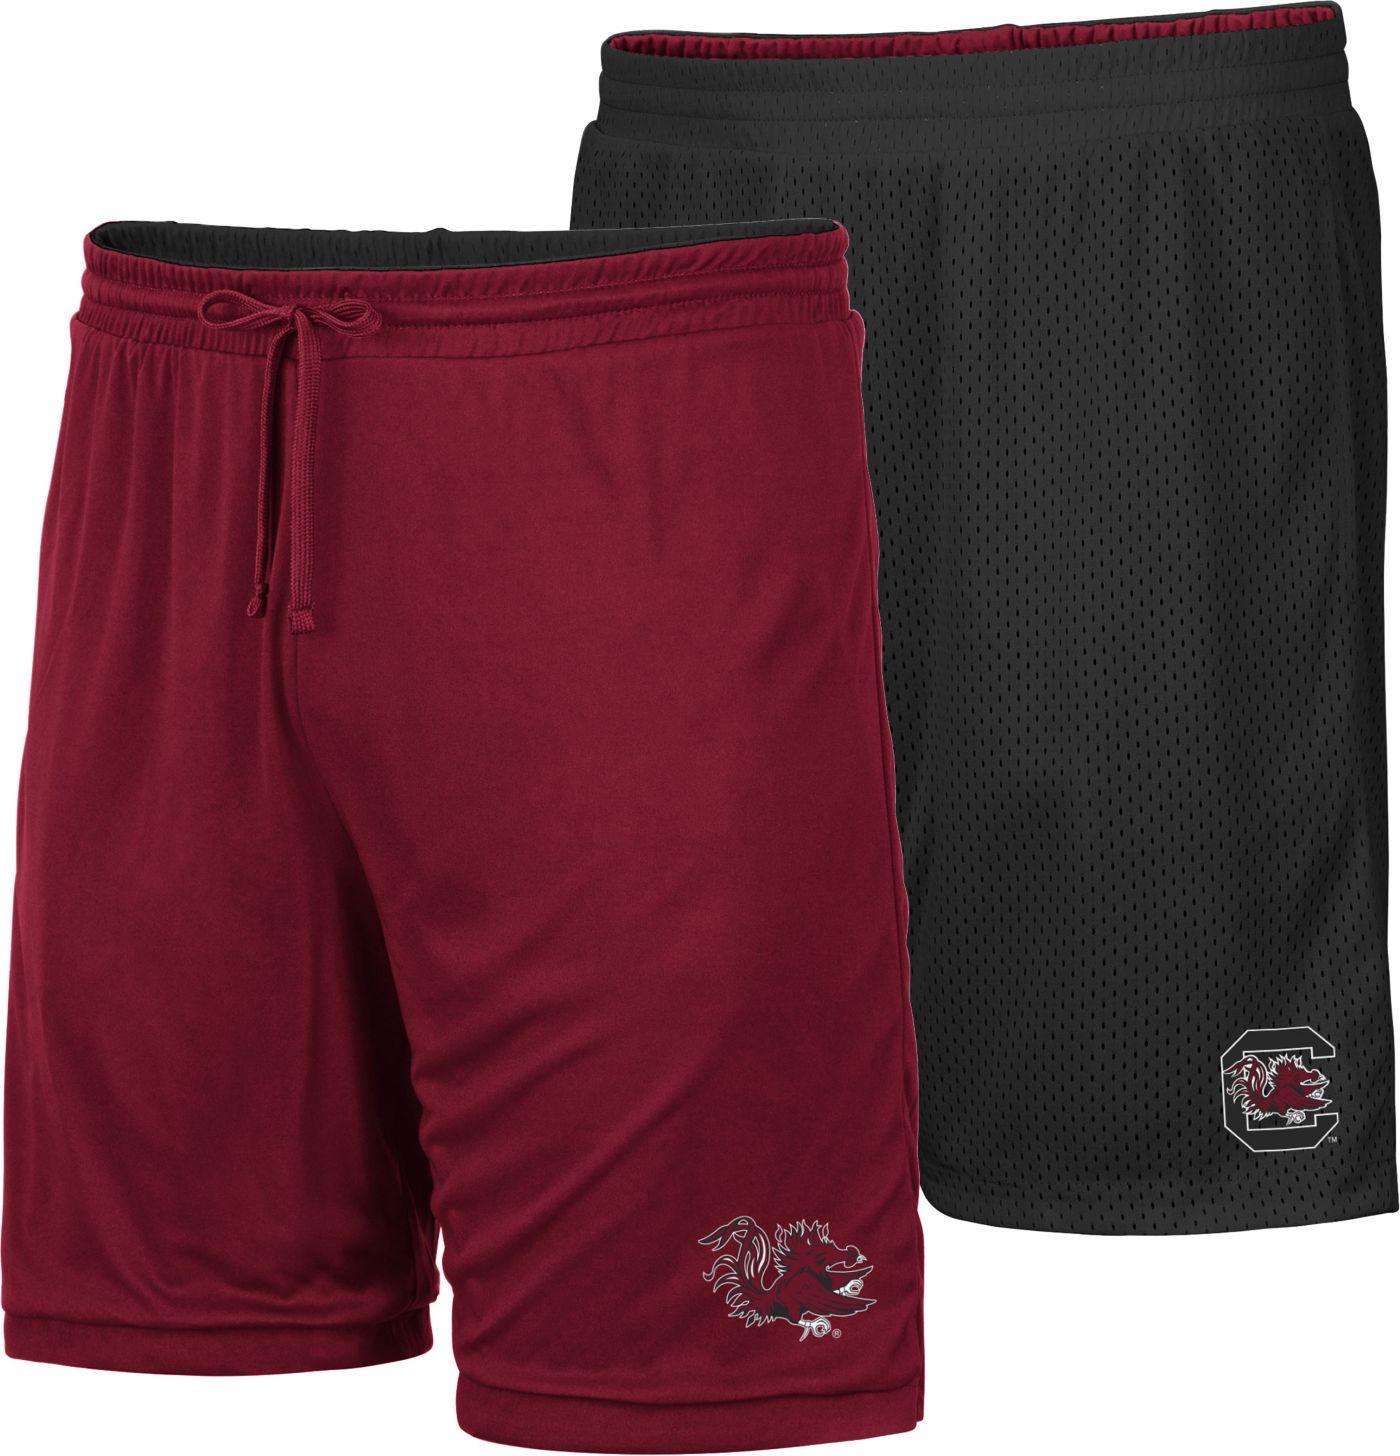 Colosseum Men's South Carolina Gamecocks Garnet/Black Wiggum Reversible Shorts